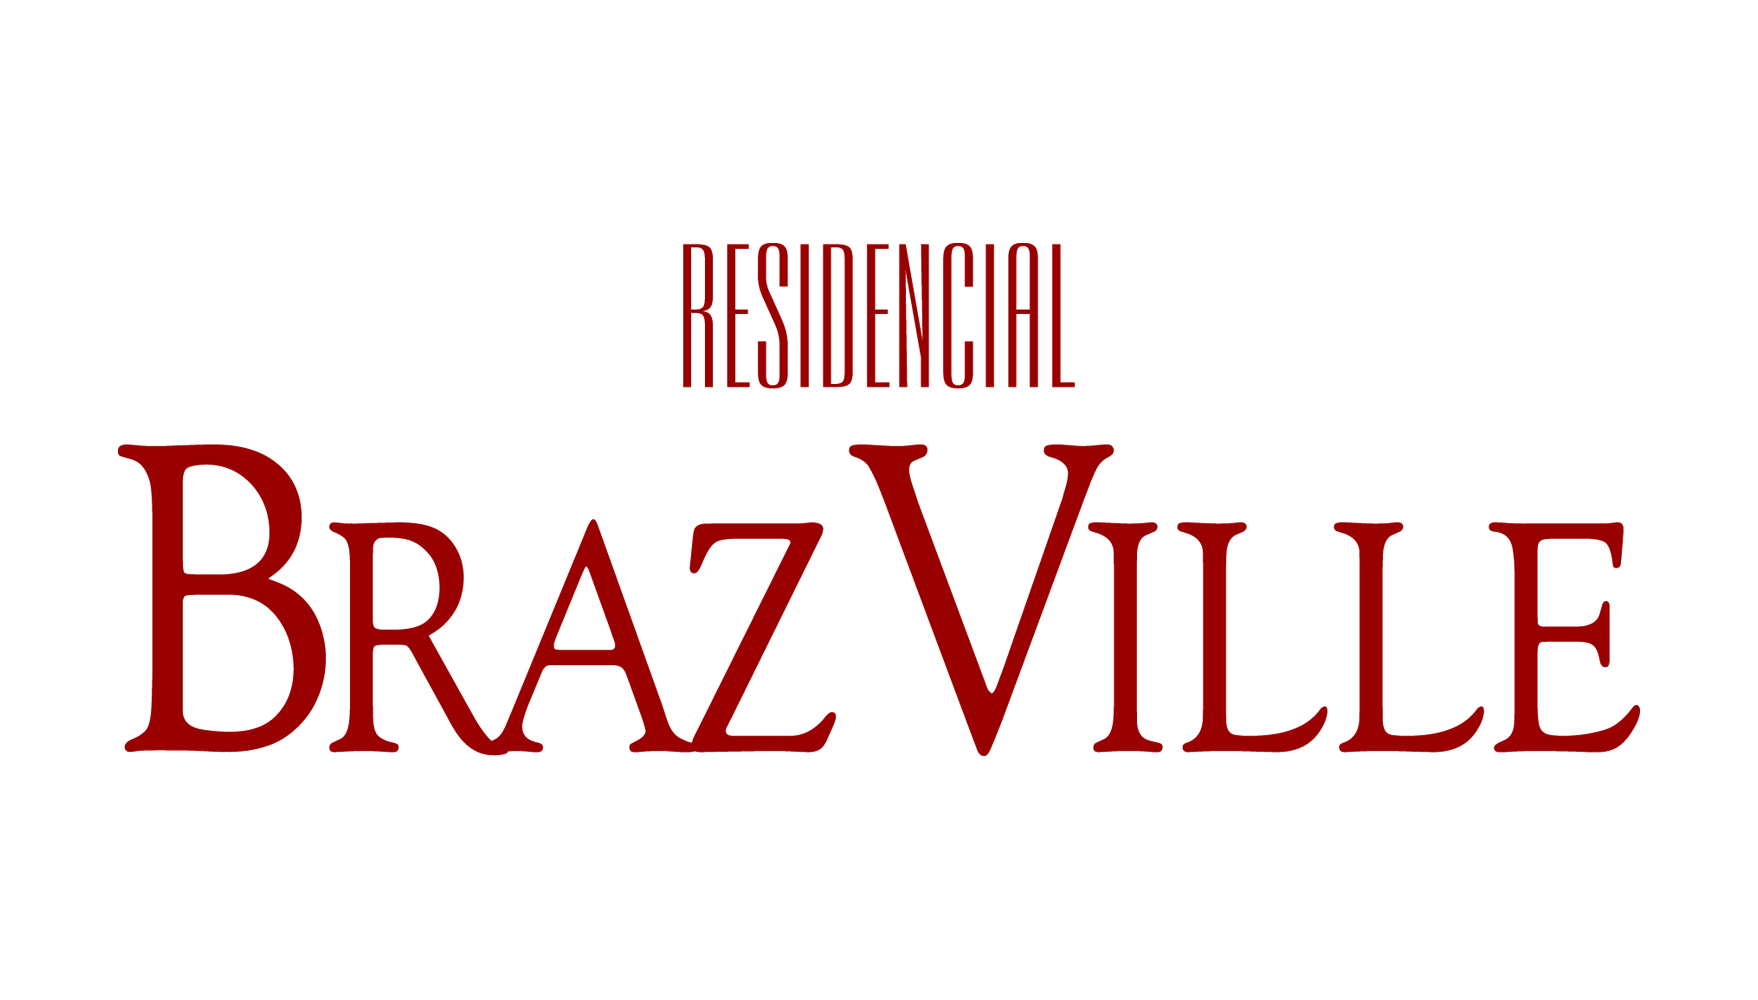 Residencial Brazville